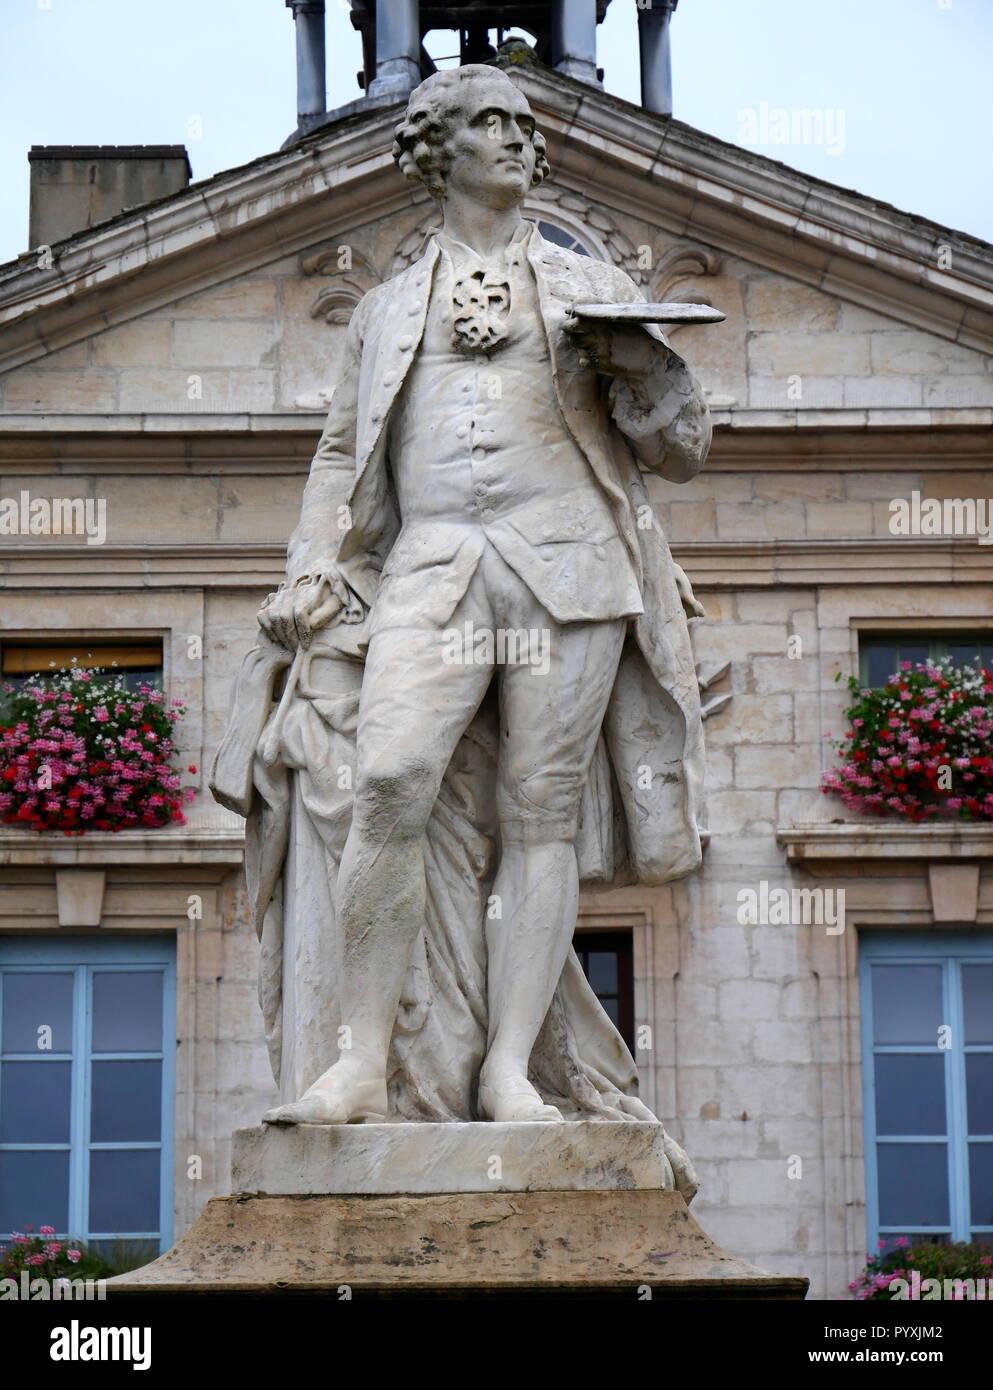 AJAXNETPHOTO. 2018. TOURNUS, FRANCE. - ARTIST STATUE - STATUE OF THE ARTIST JEAN-BAPTISTE GREUZE (1725-1805) WHO WAS BORN IN THE TOWN.  PHOTO:JONATHAN EASTLAND/AJAX REF:GX8 180910 866 Stock Photo